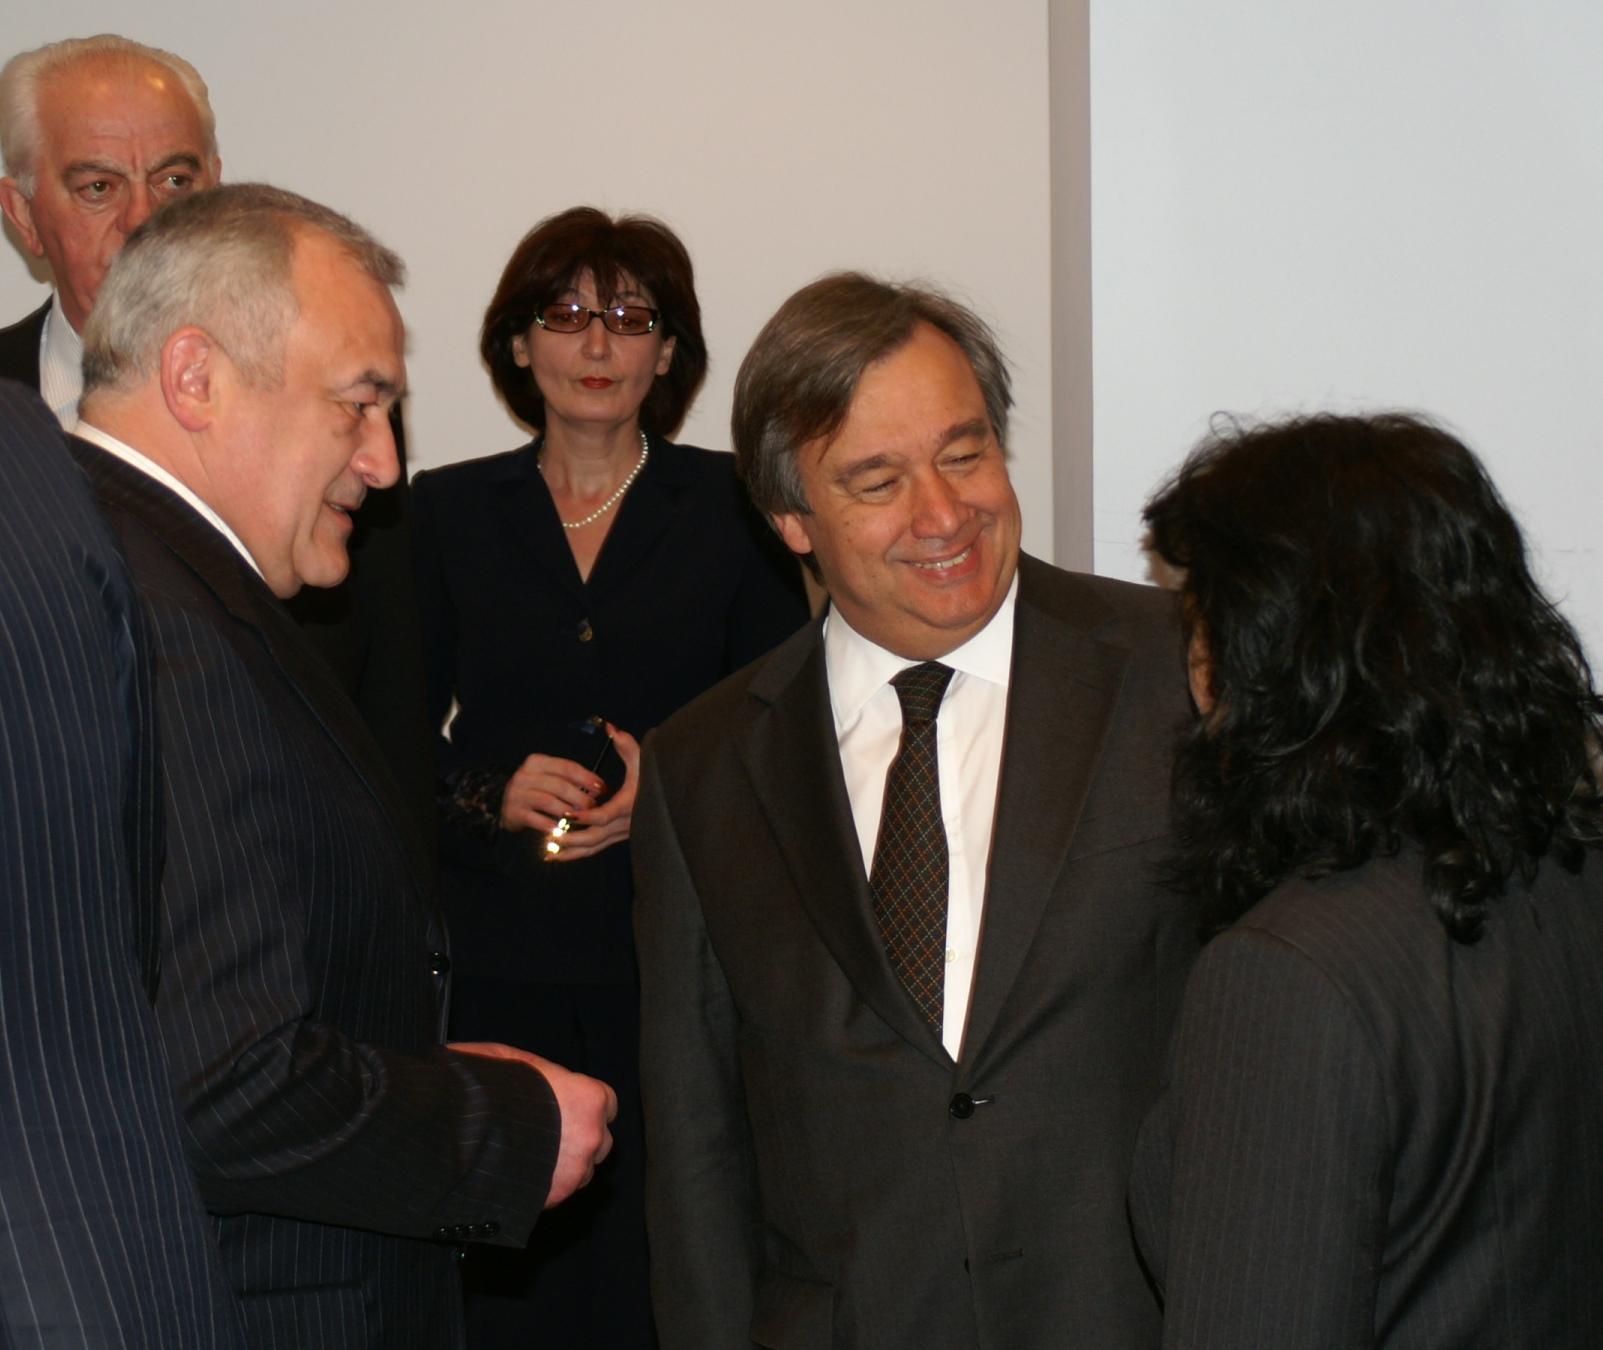 Мамсуров поздравил нового генсека ООН